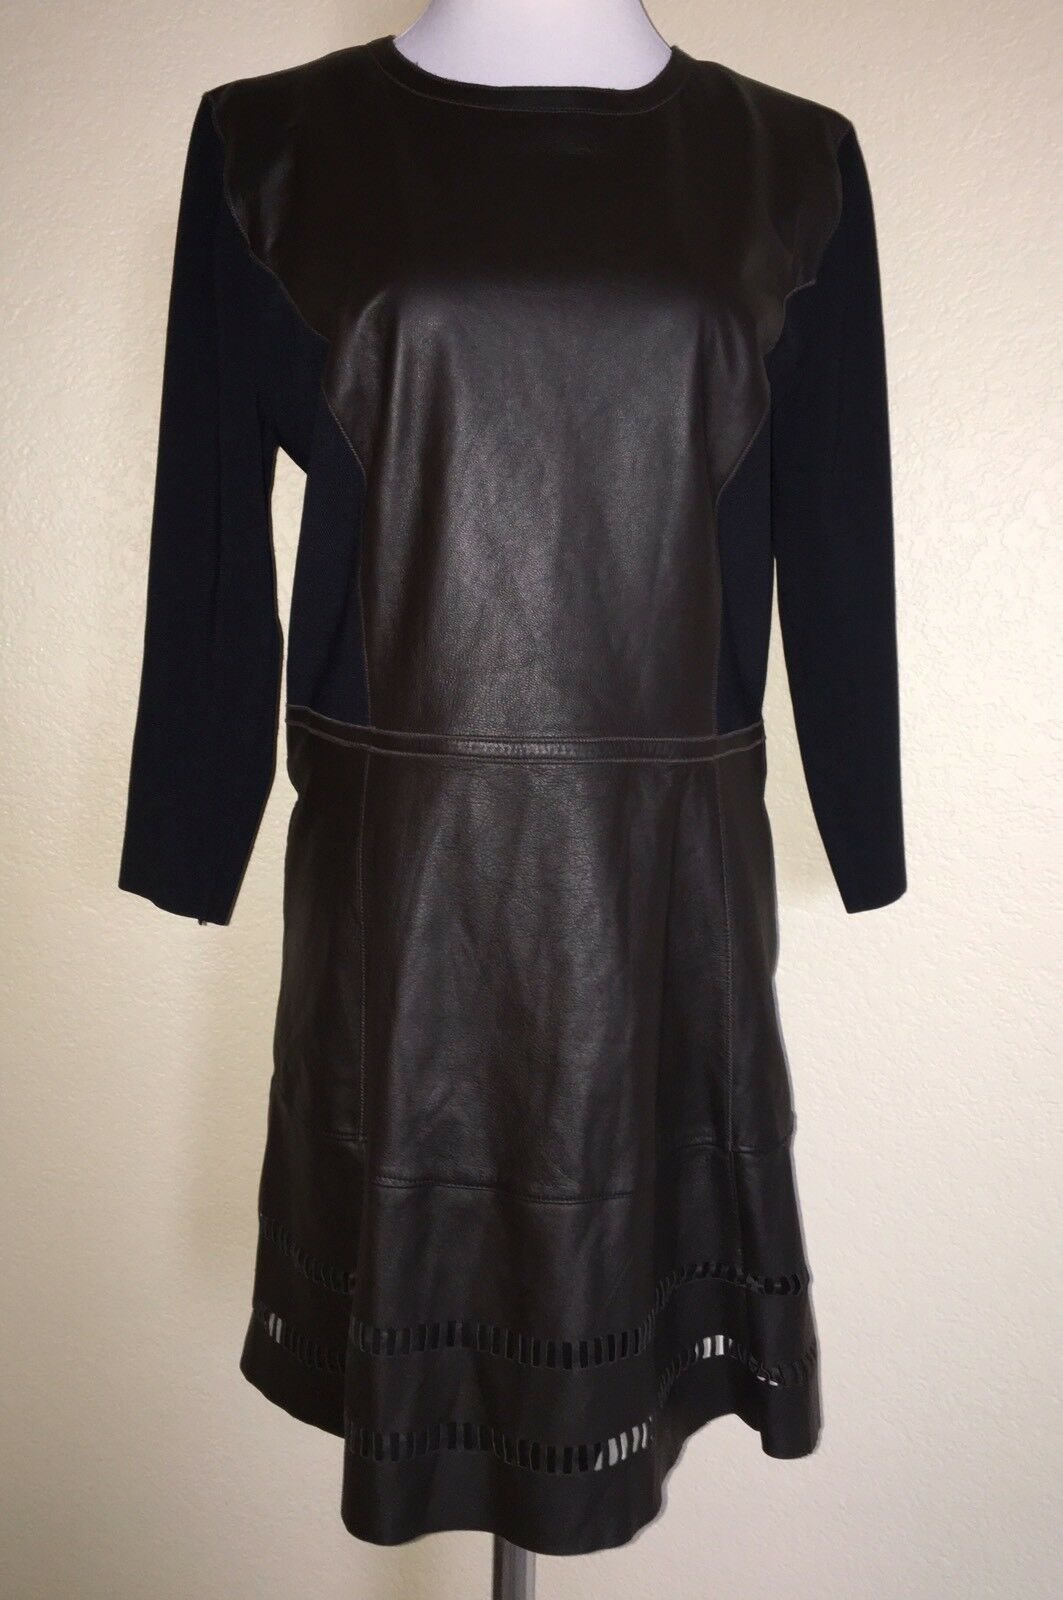 ELIE TAHARI Brown Leather Laser Cut Long Sleeve Dress Size 14 NEW